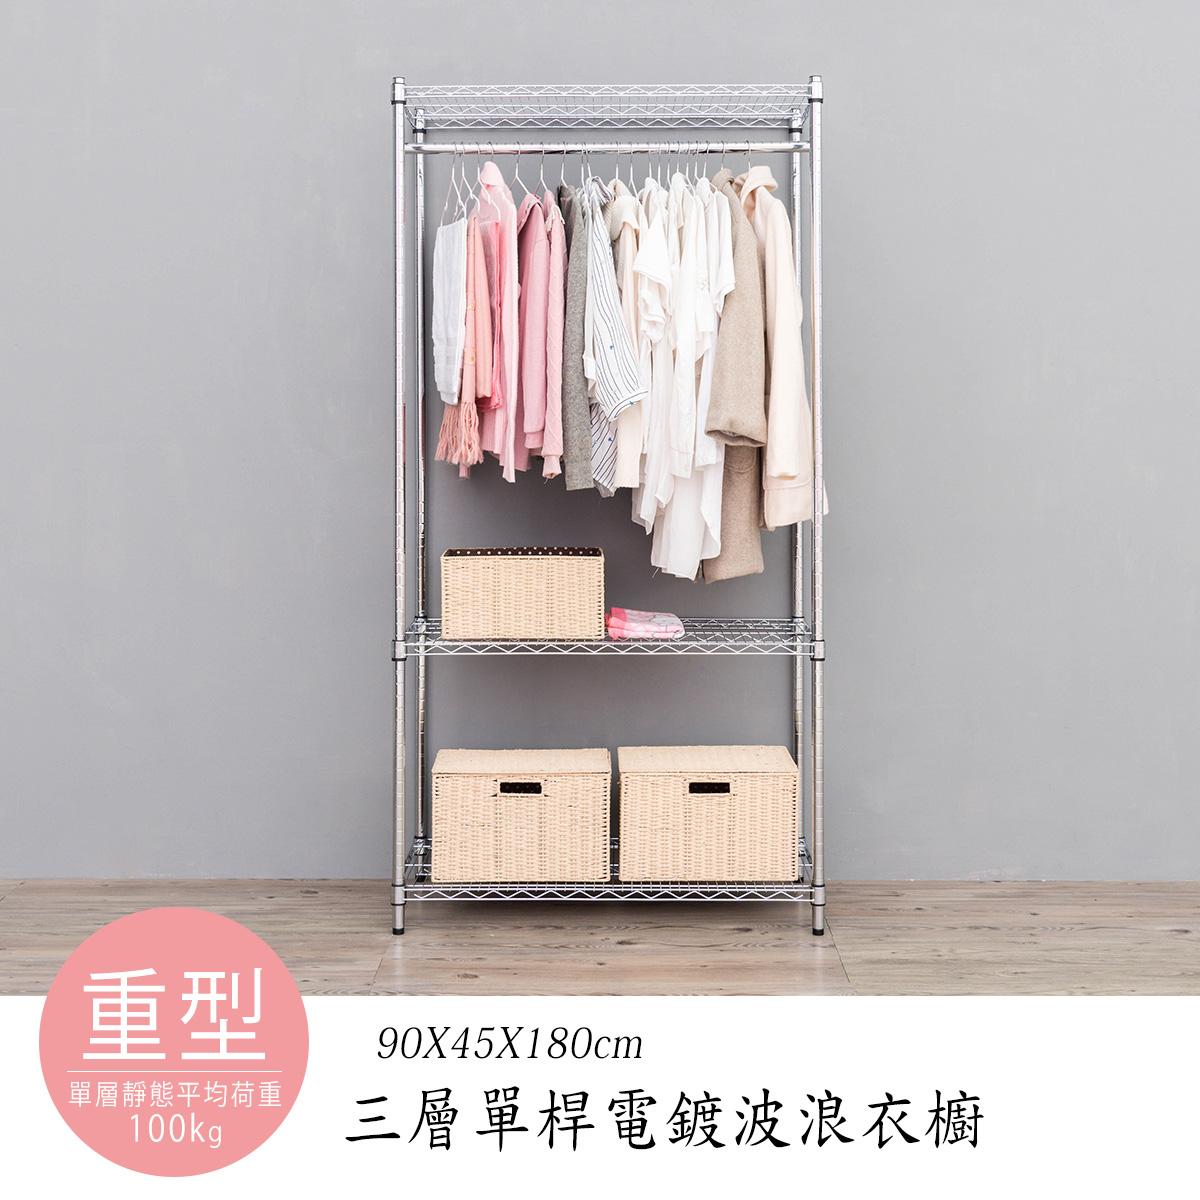 【dayneeds】90X45X180cm 荷重型三層單桿電鍍波浪衣櫥